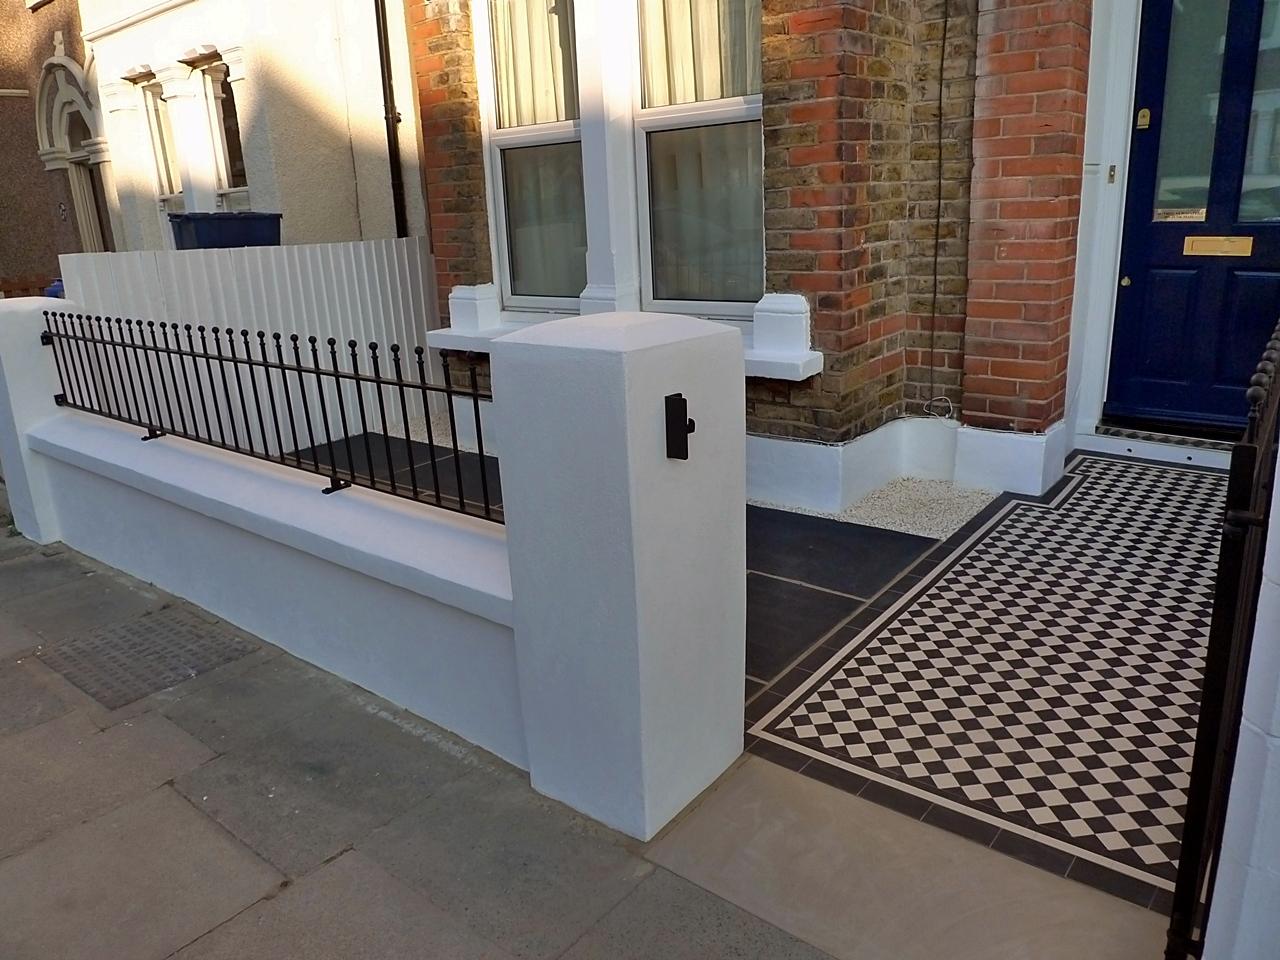 classic-victorian-balck-and-white-mosaic-tile-path-anewgarden-london.JPG